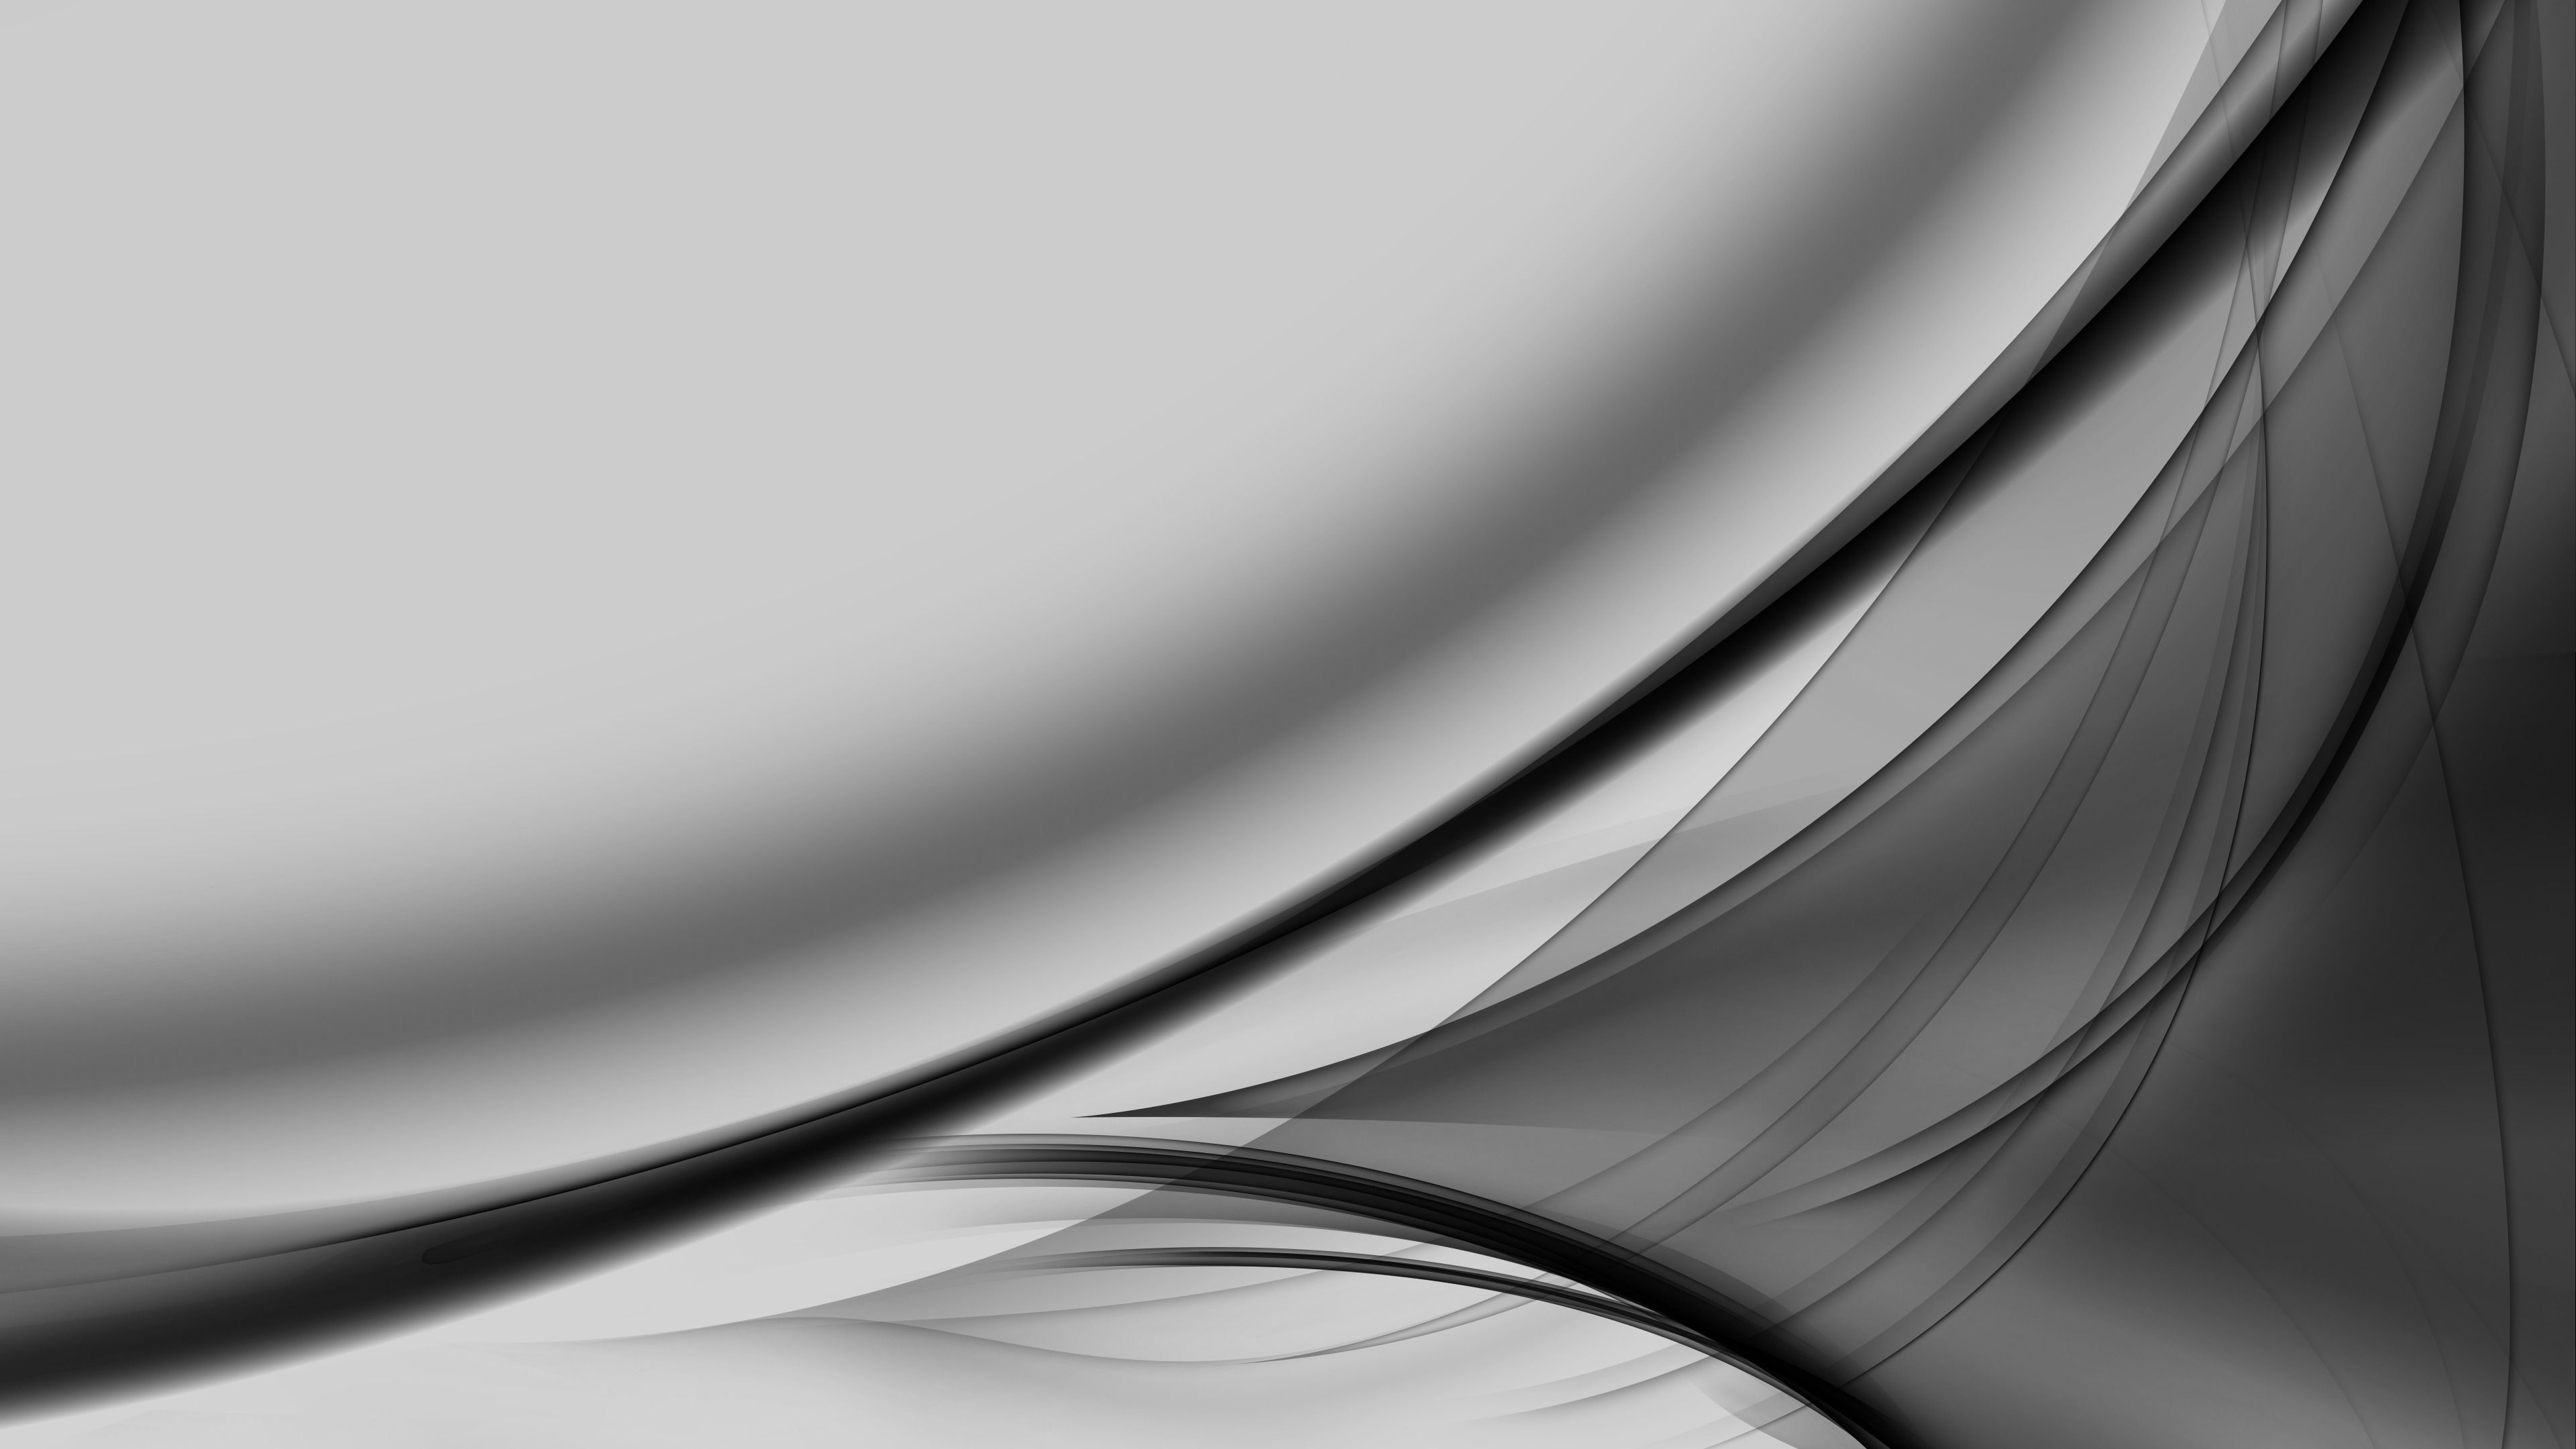 Grey Desktop Wallpapers - Top Free Grey Desktop ...